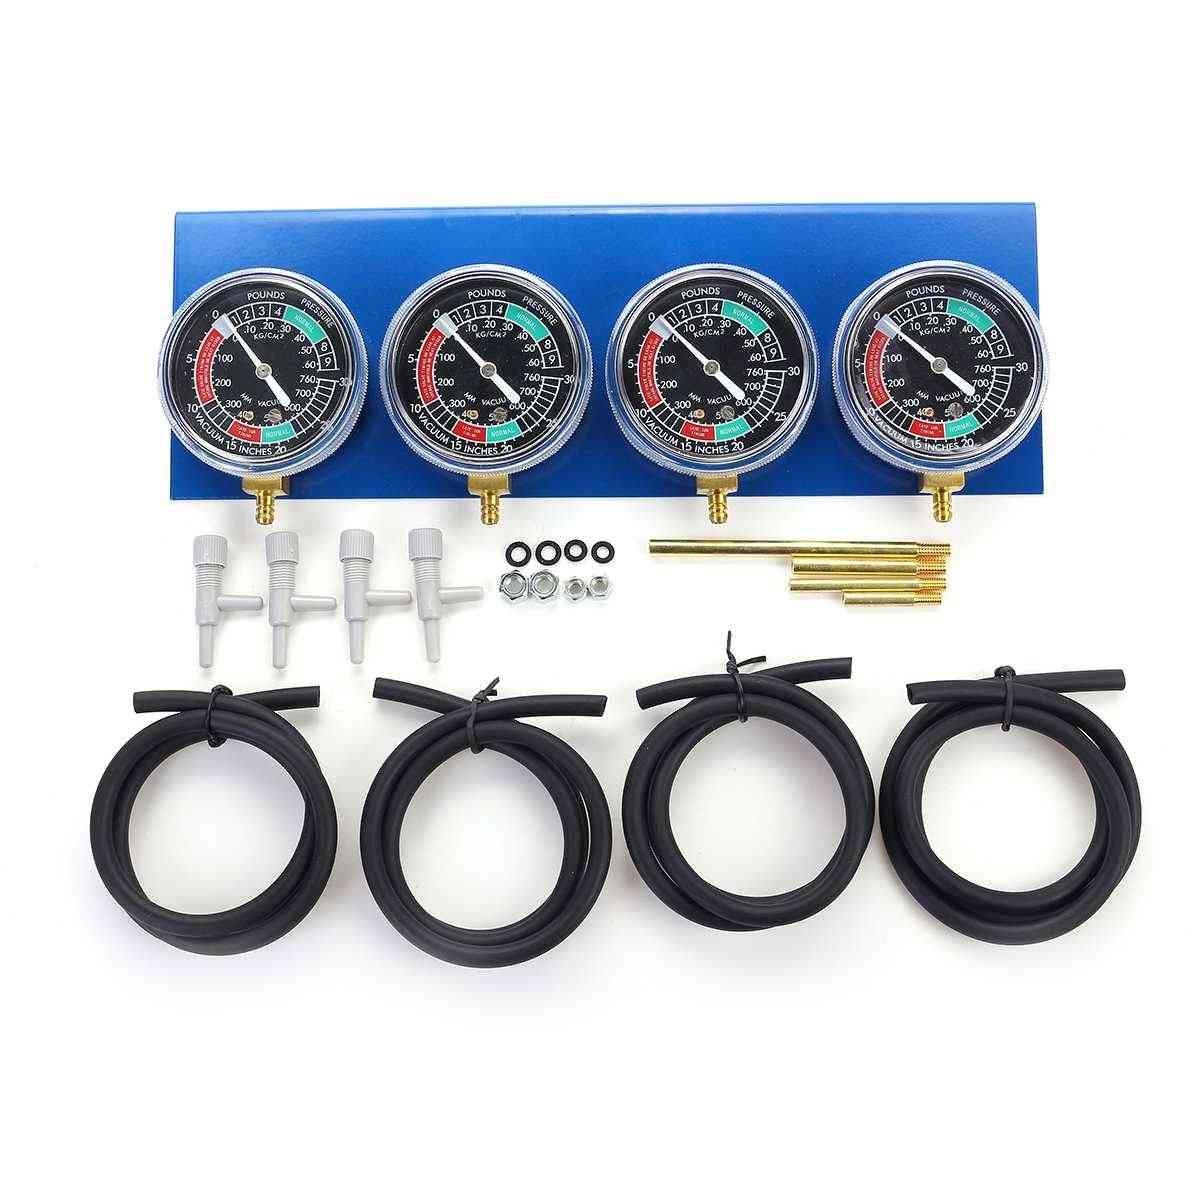 Motorcycle Carburetor Vacuum Gauge Balancer Synchronizer Tool